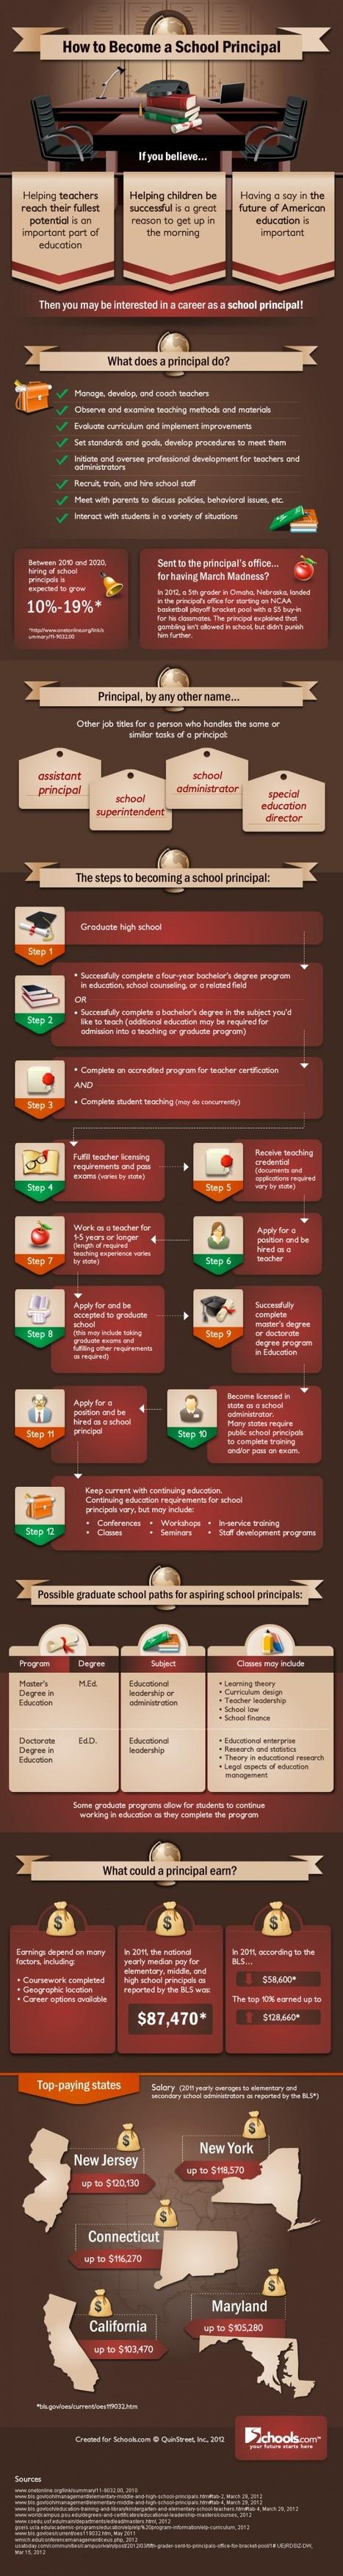 How (And Why) You Should Become A School Principal | Banco de Aulas | Scoop.it